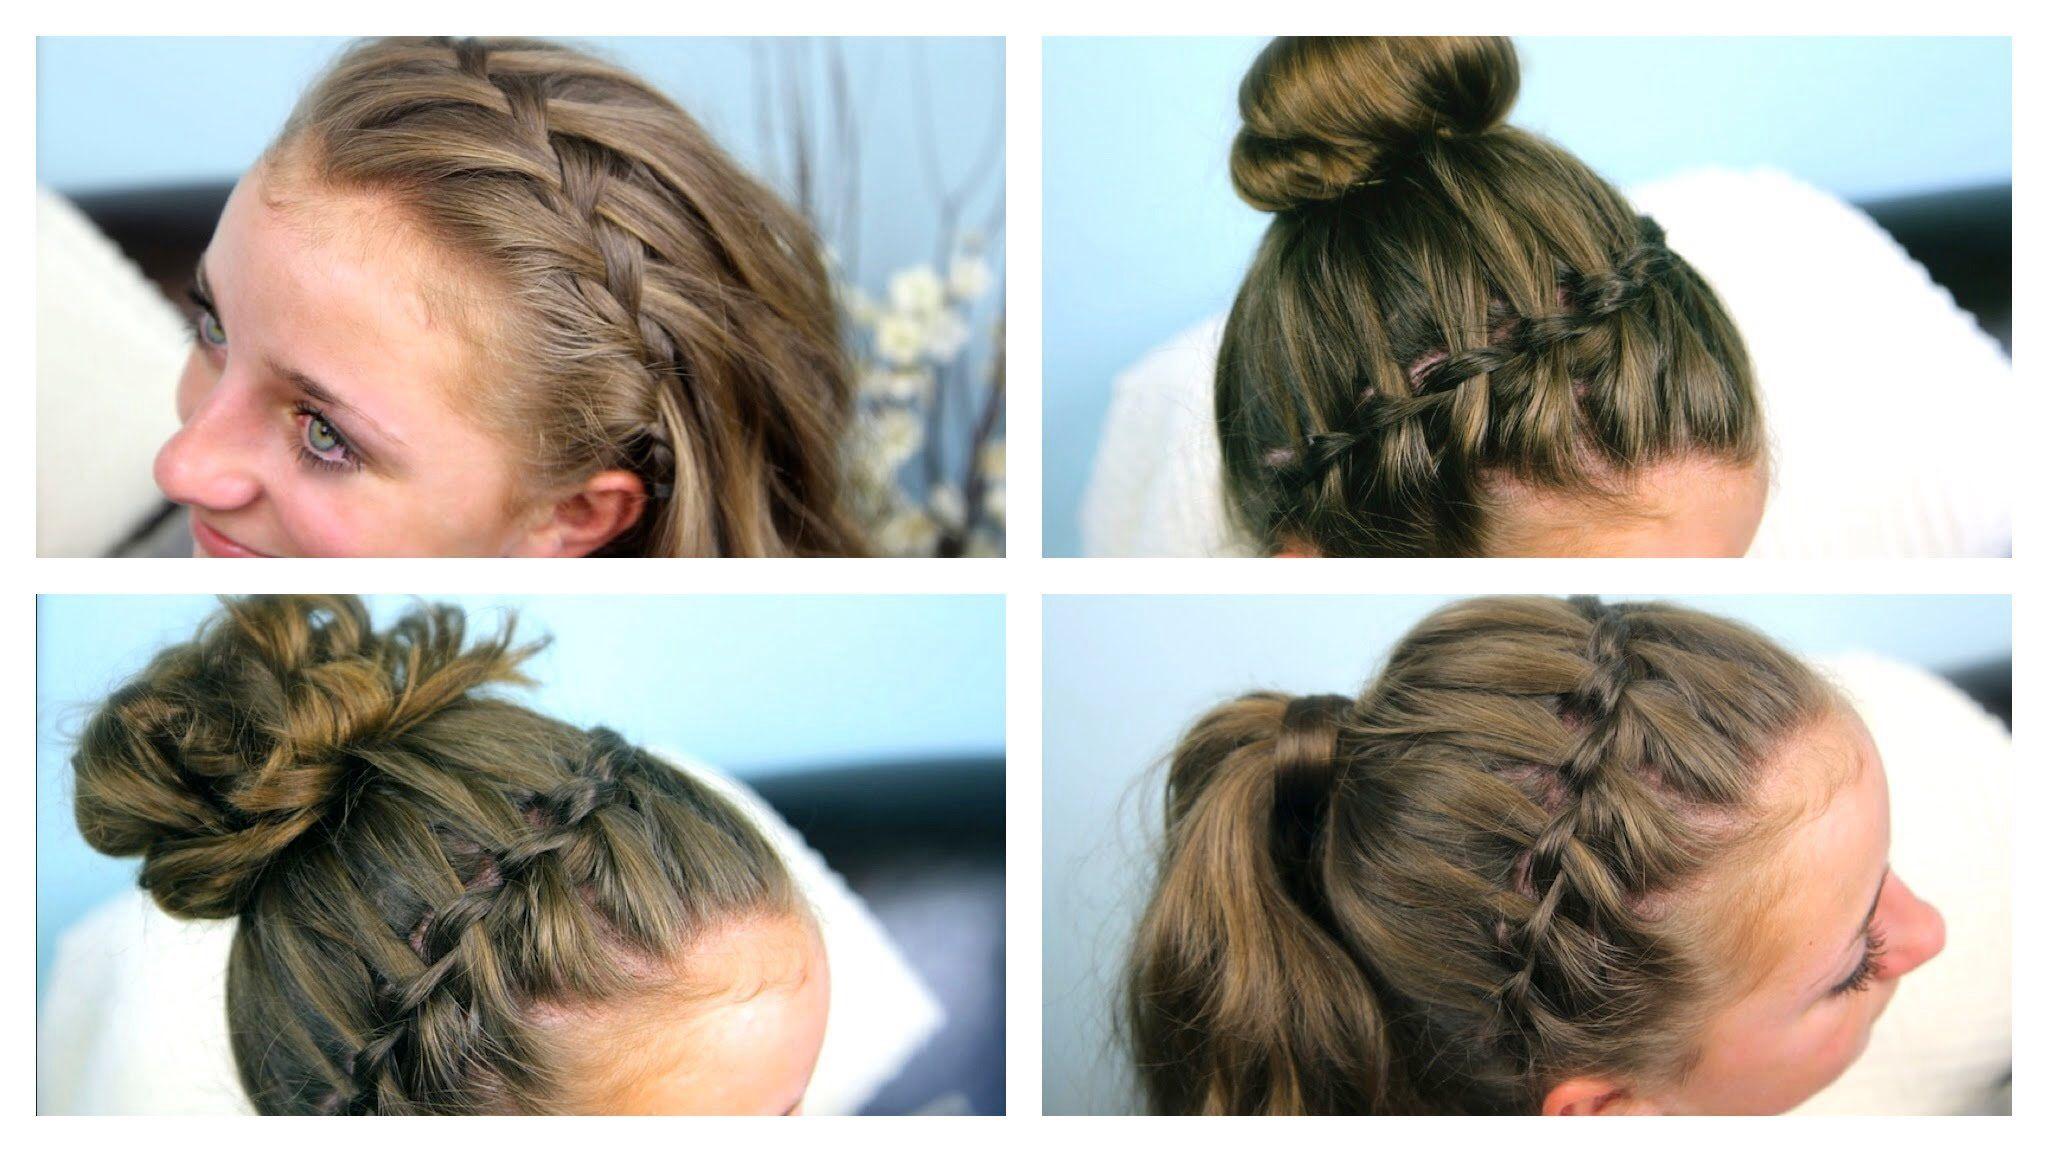 Astonishing 1000 Images About Cute Girl Hiarstyles On Pinterest Fish Tales Short Hairstyles Gunalazisus